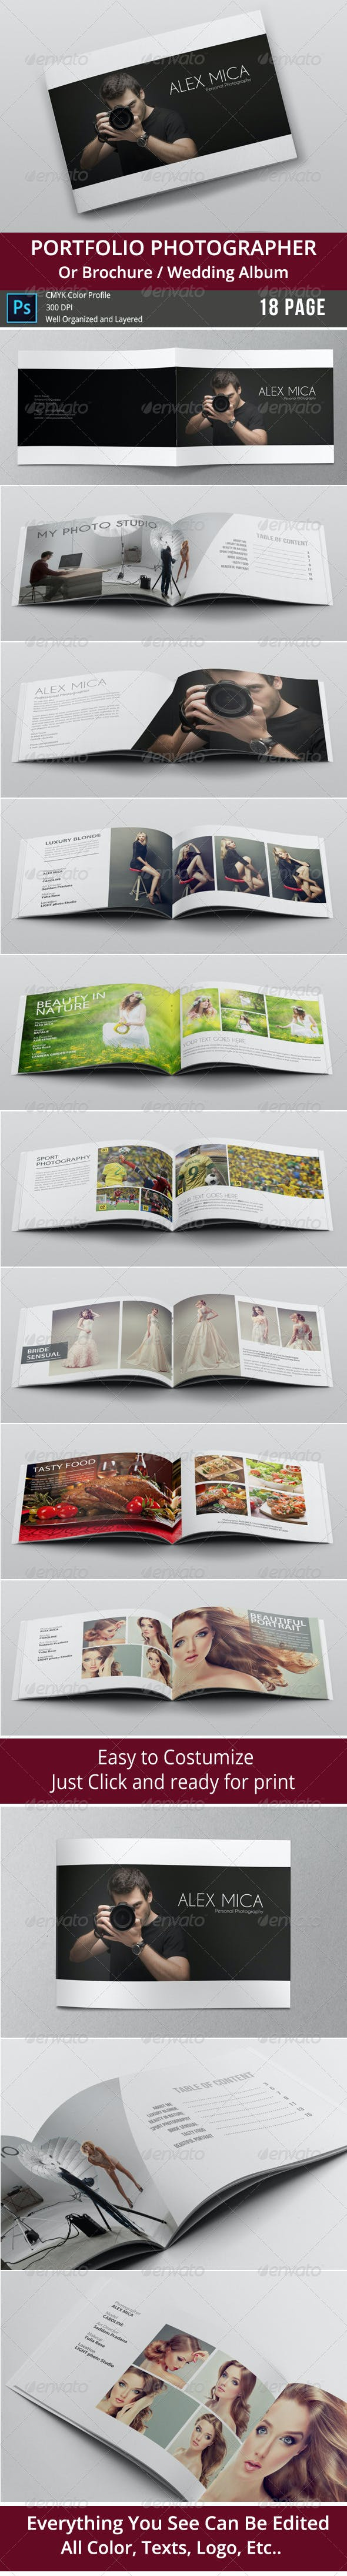 18 Pages Photography Portfolio or Photo Album